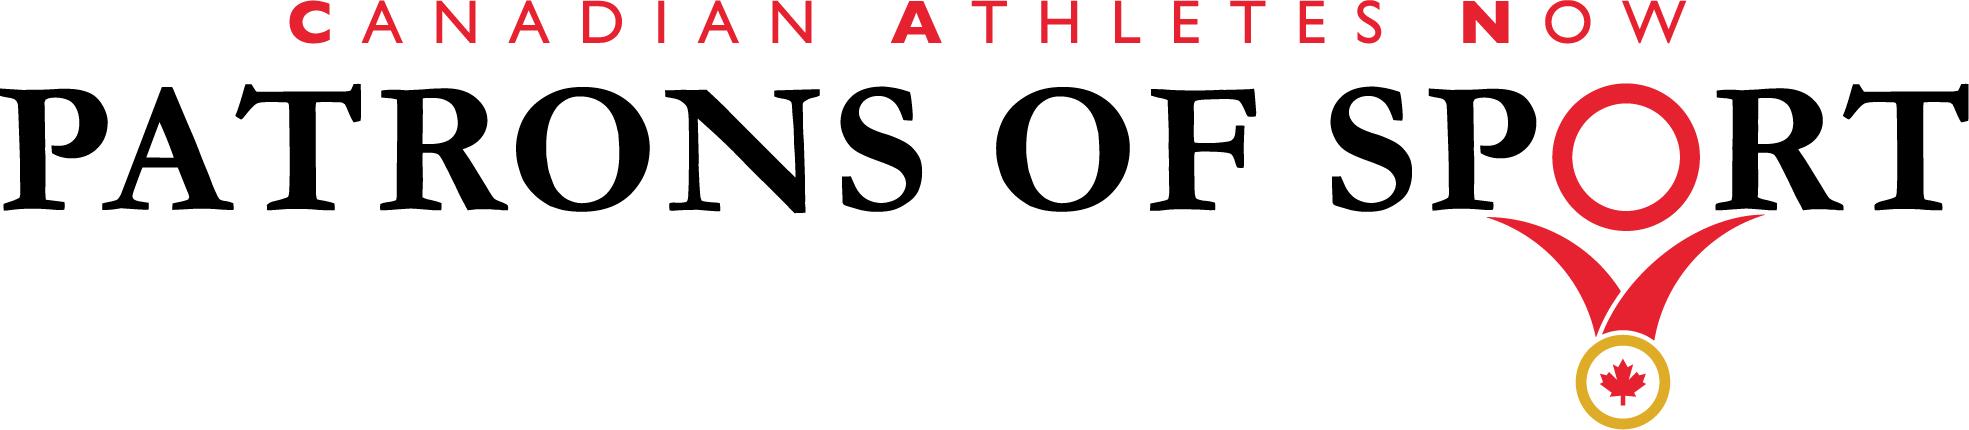 patrons of sport-logo-fullcolour copy